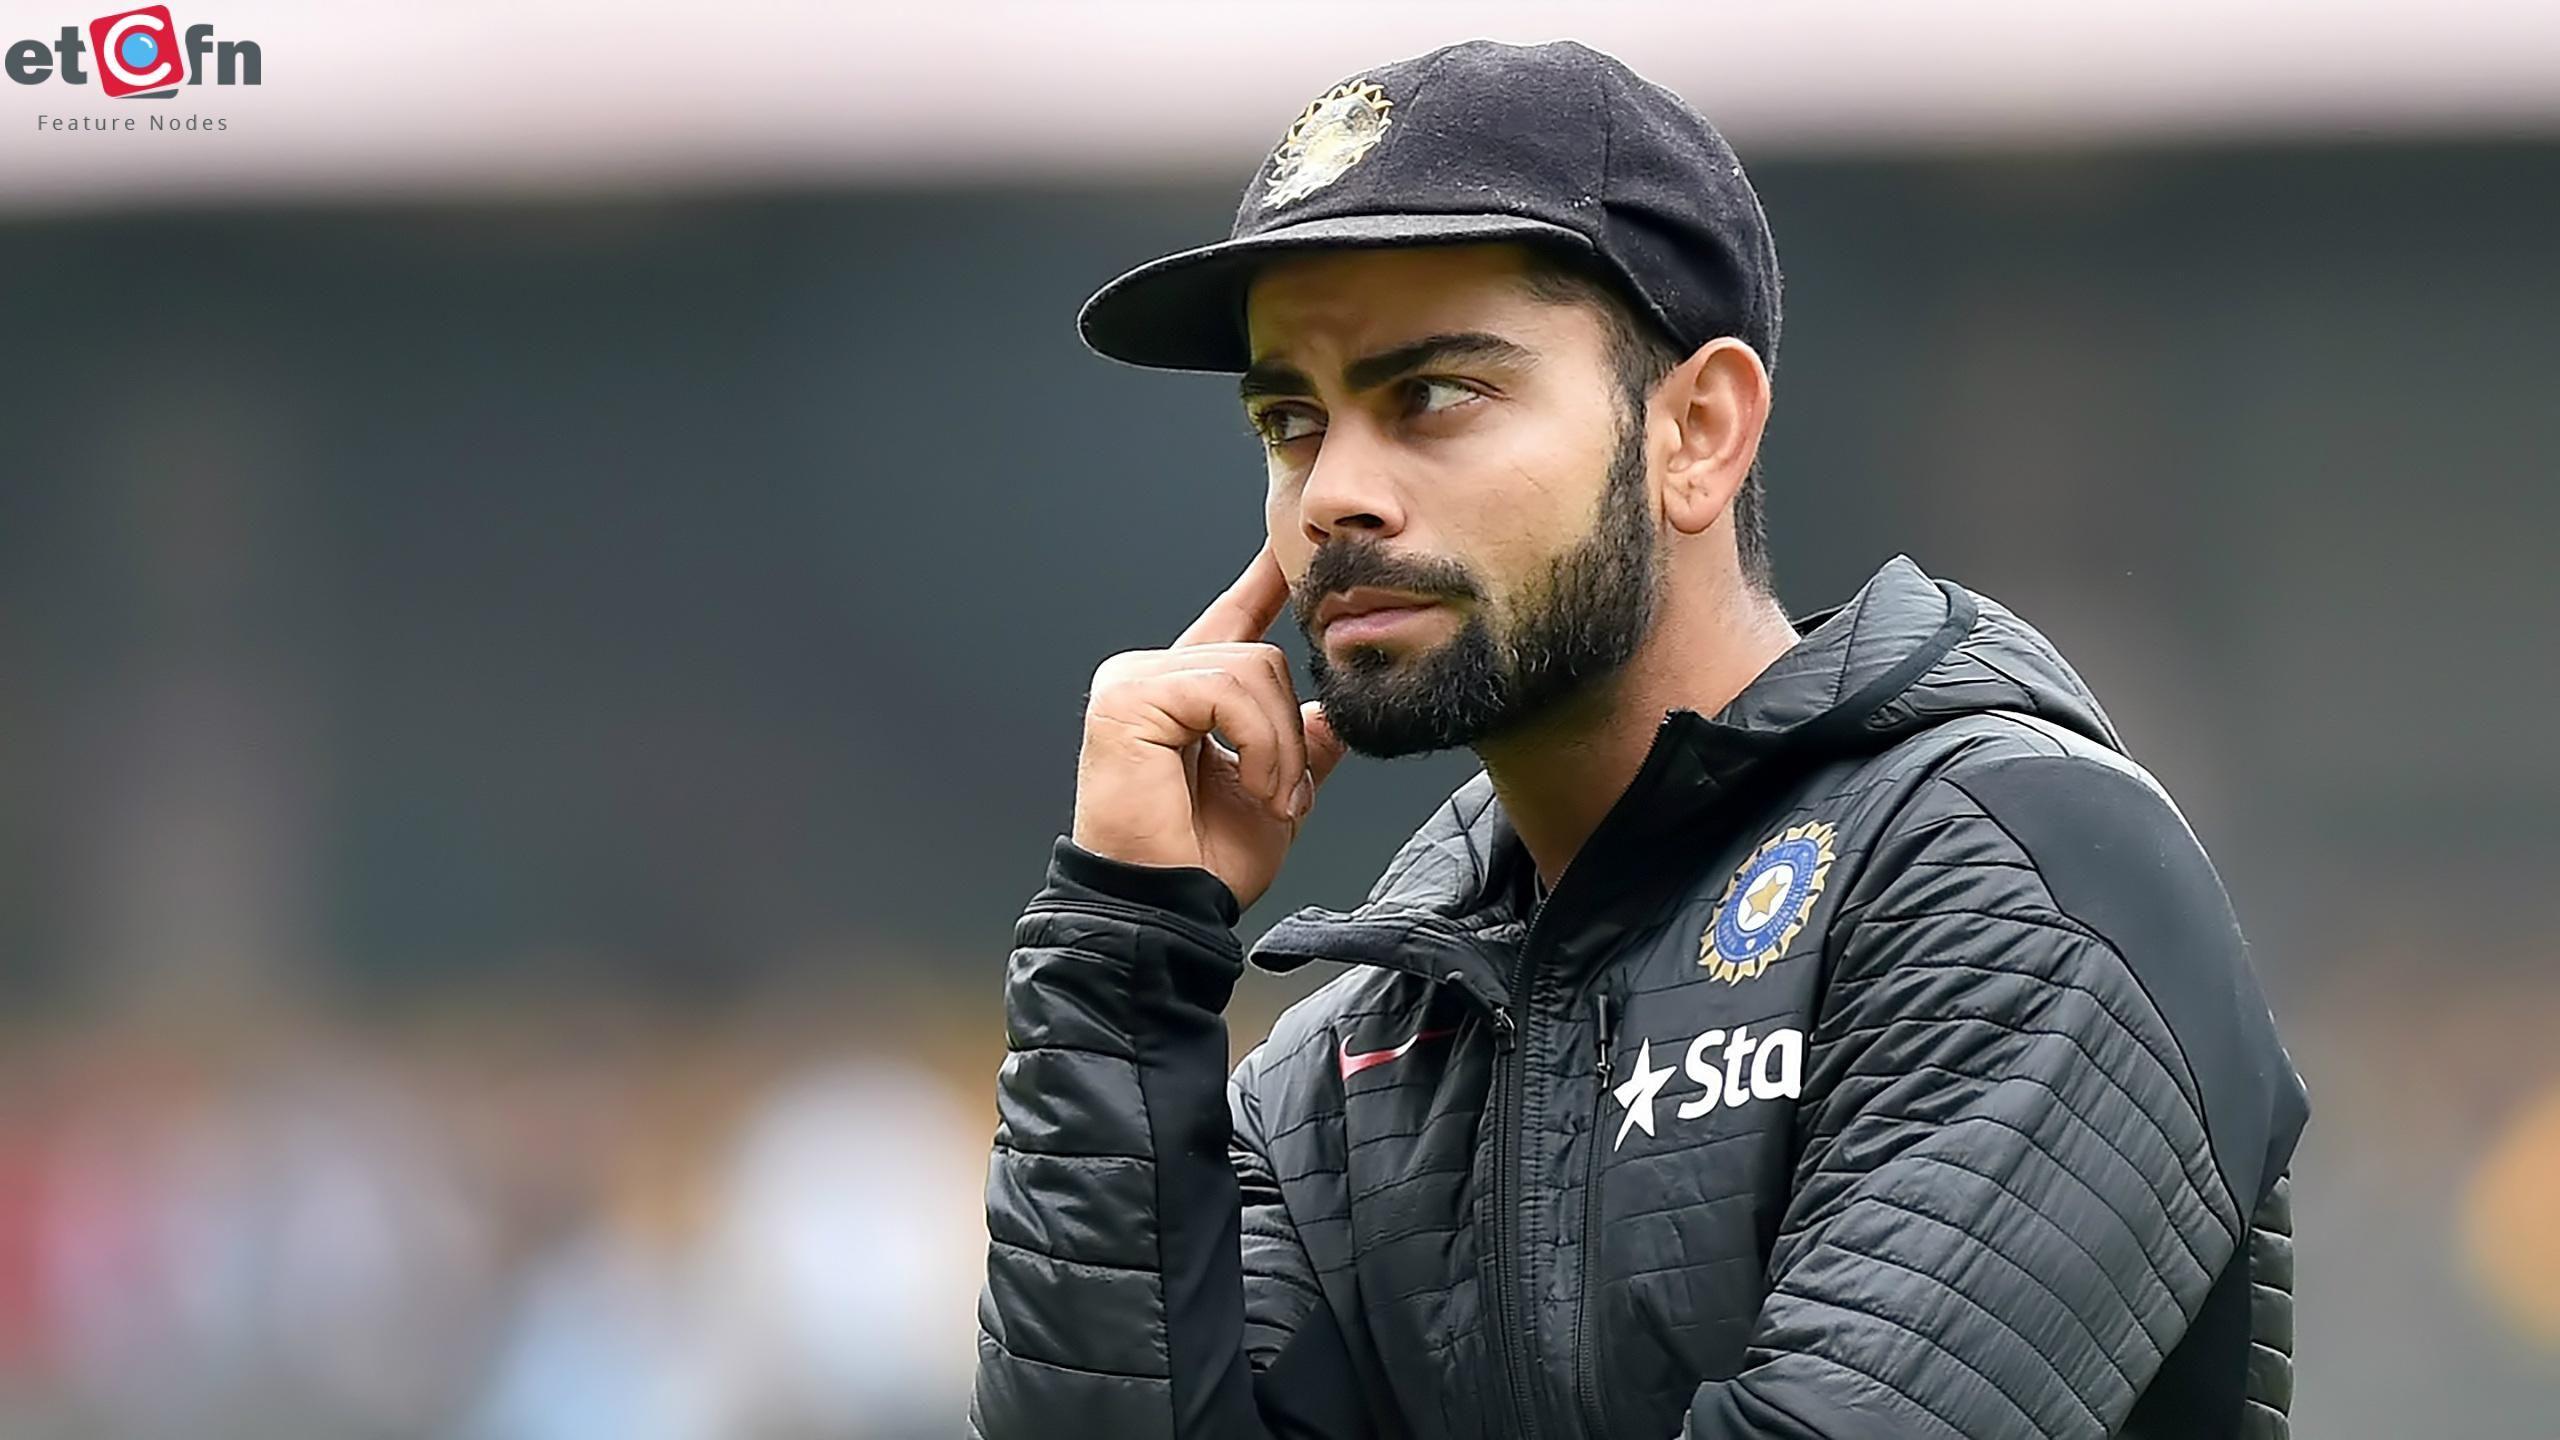 virat kohli hd wallpapers and biography | indian cricketer